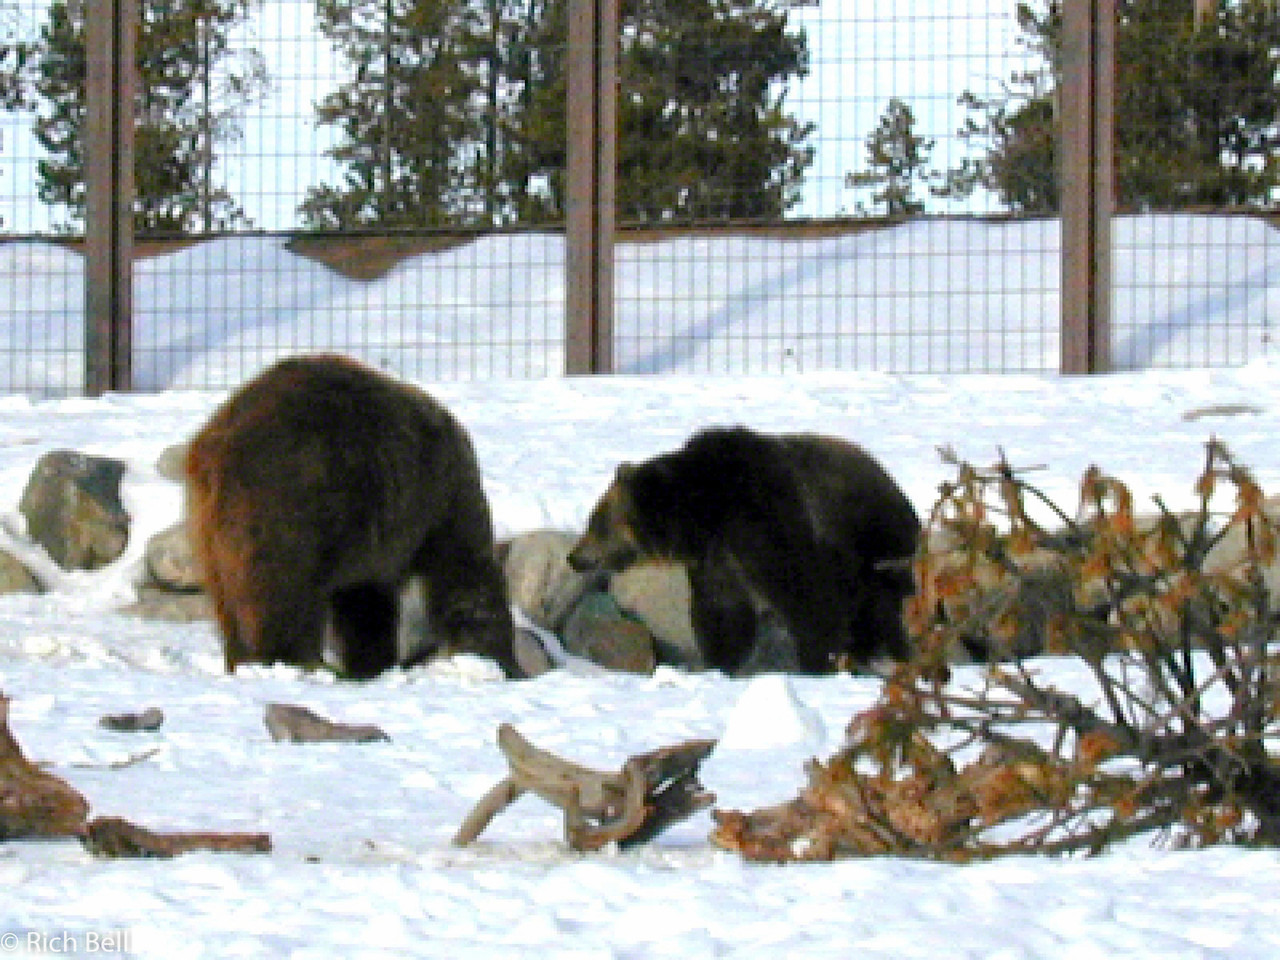 20100721Bear in West Yellowstone Montana 0005